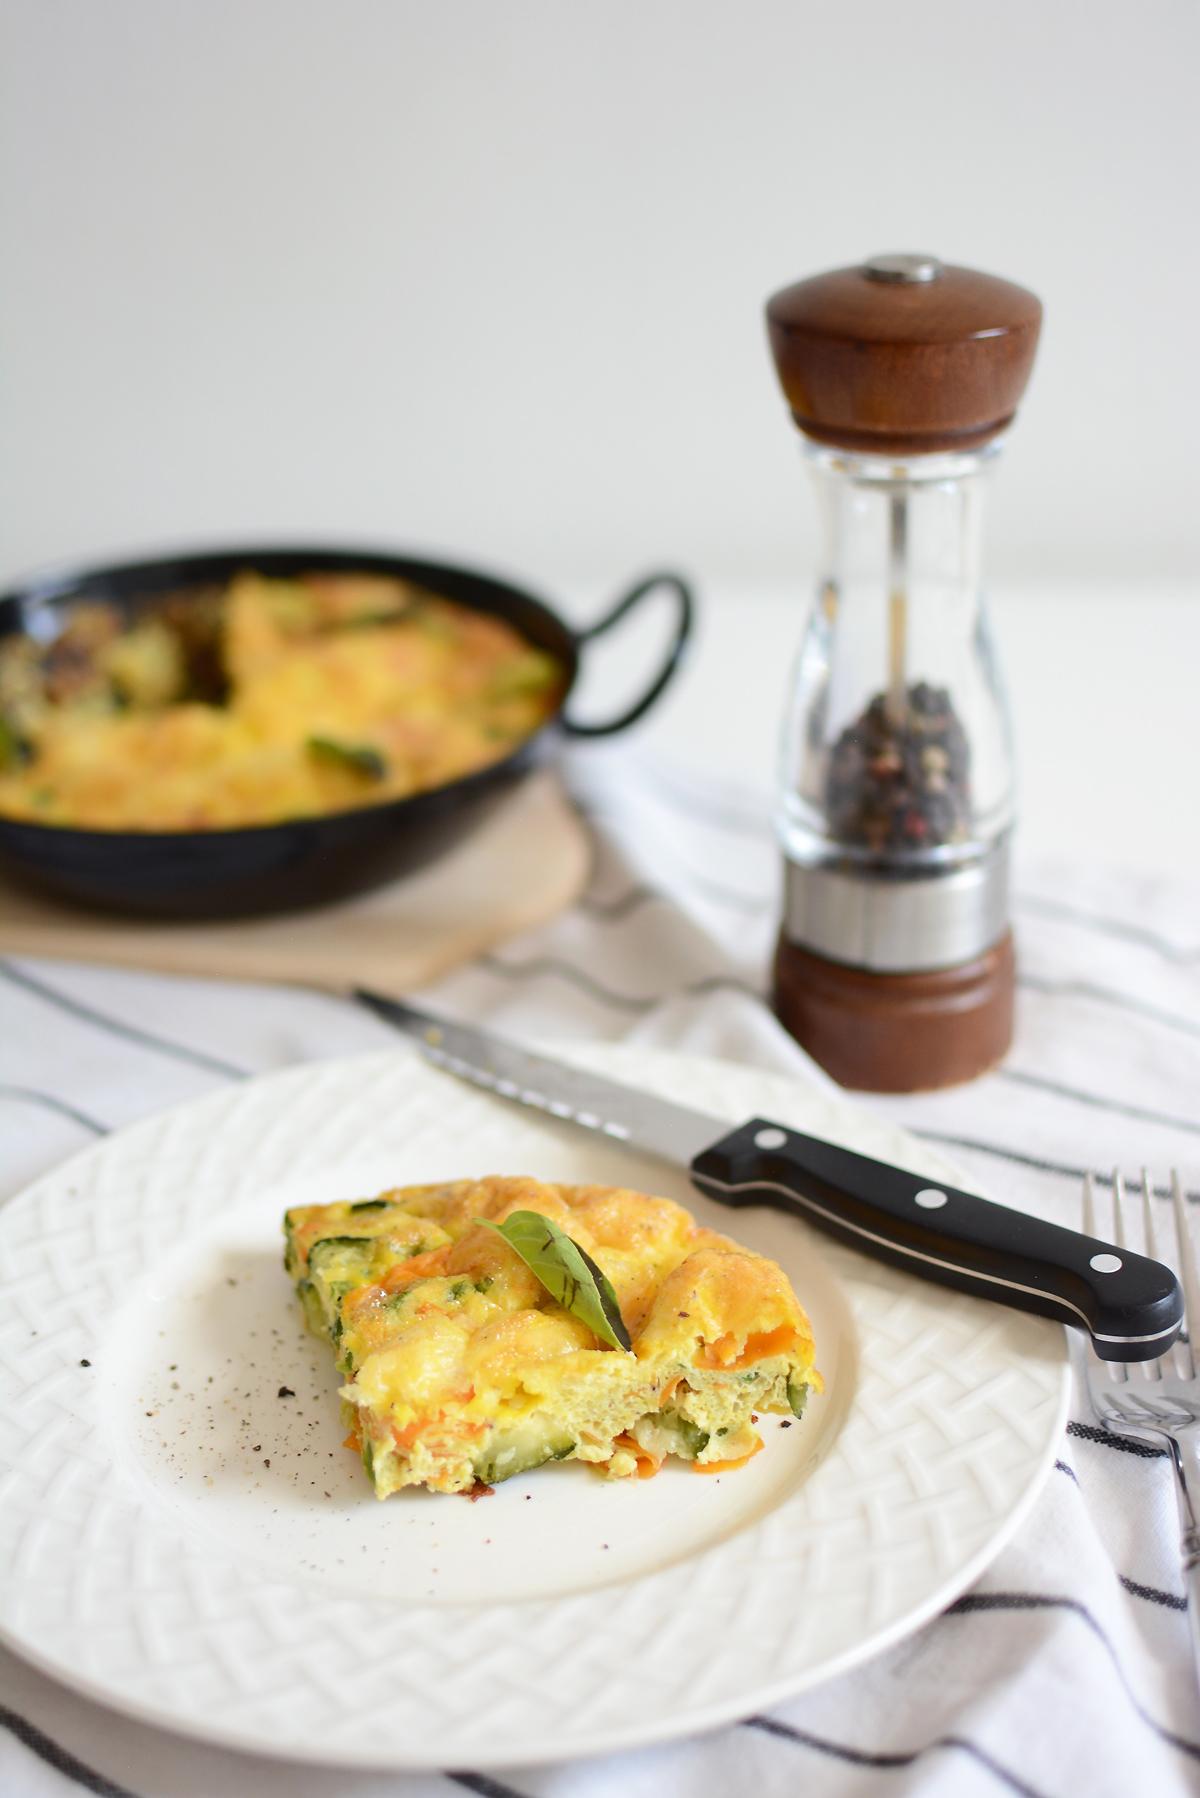 Veggie-Gemuese-Frittata-rezept_PiximitMilch